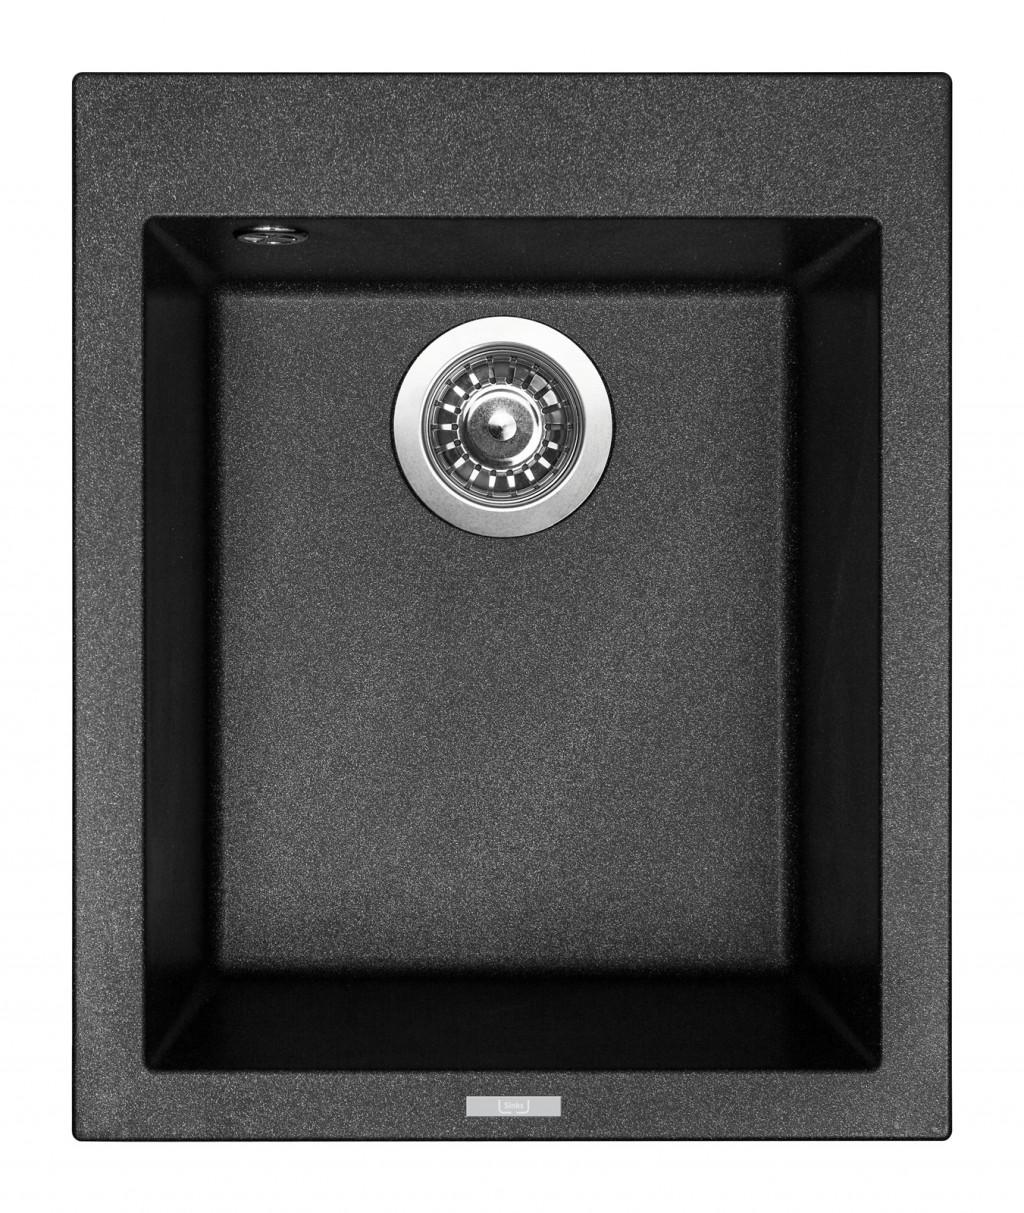 Sinks CUBE 410 Metalblack